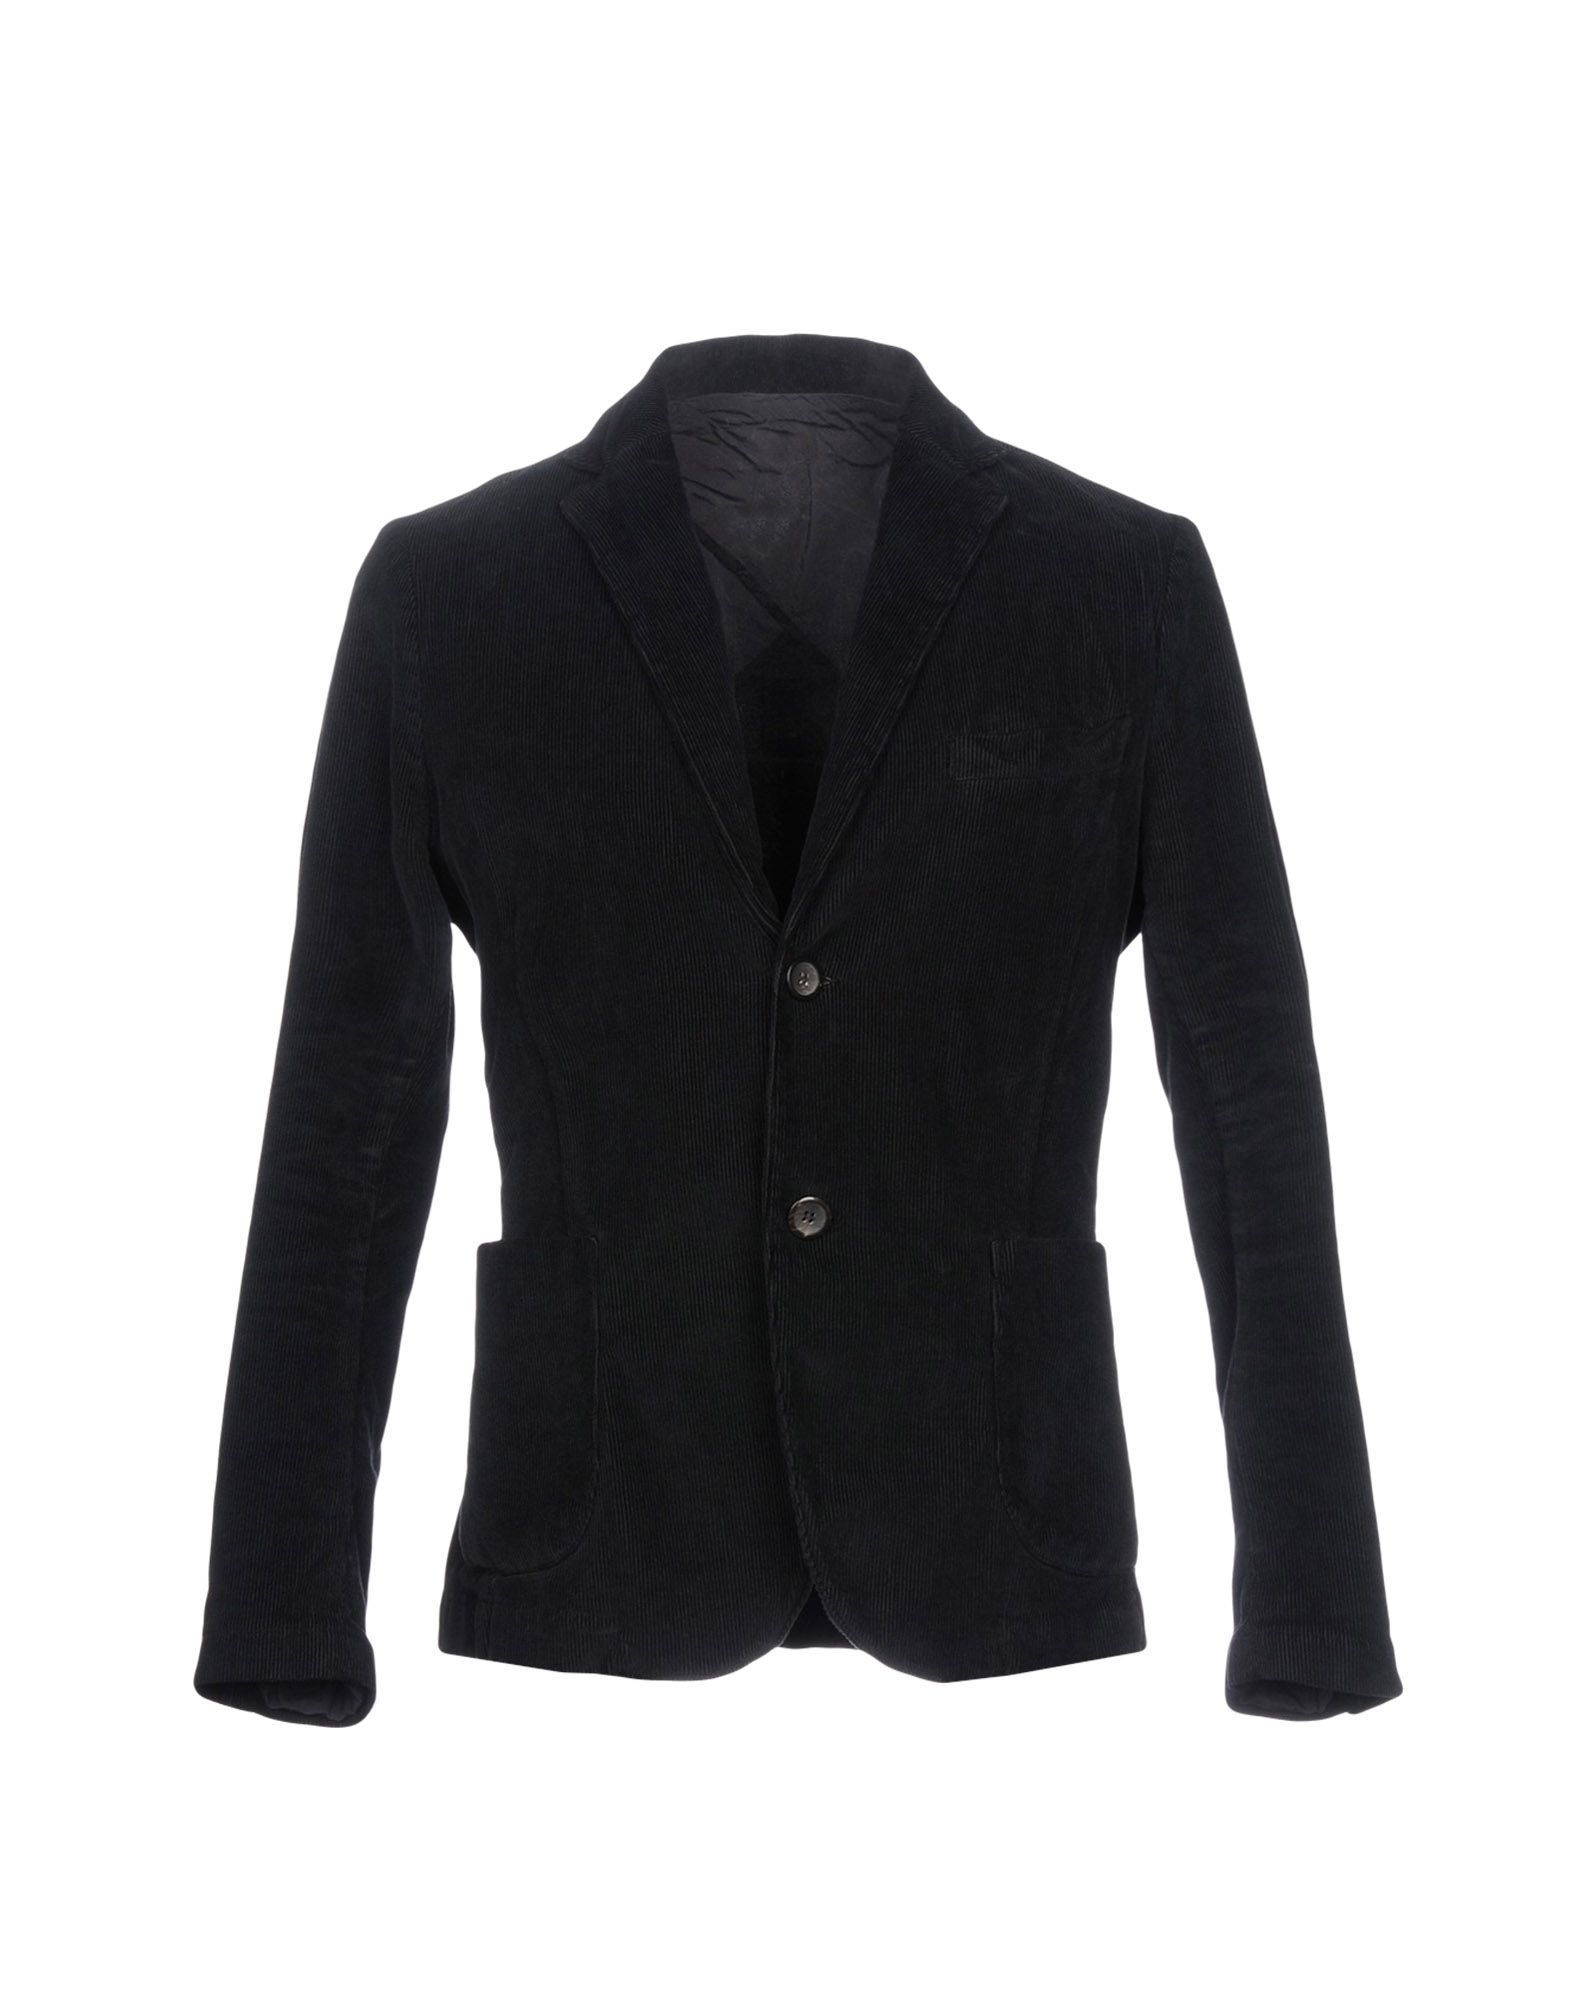 AUTHENTIC ORIGINAL VINTAGE STYLE Blazer in Black